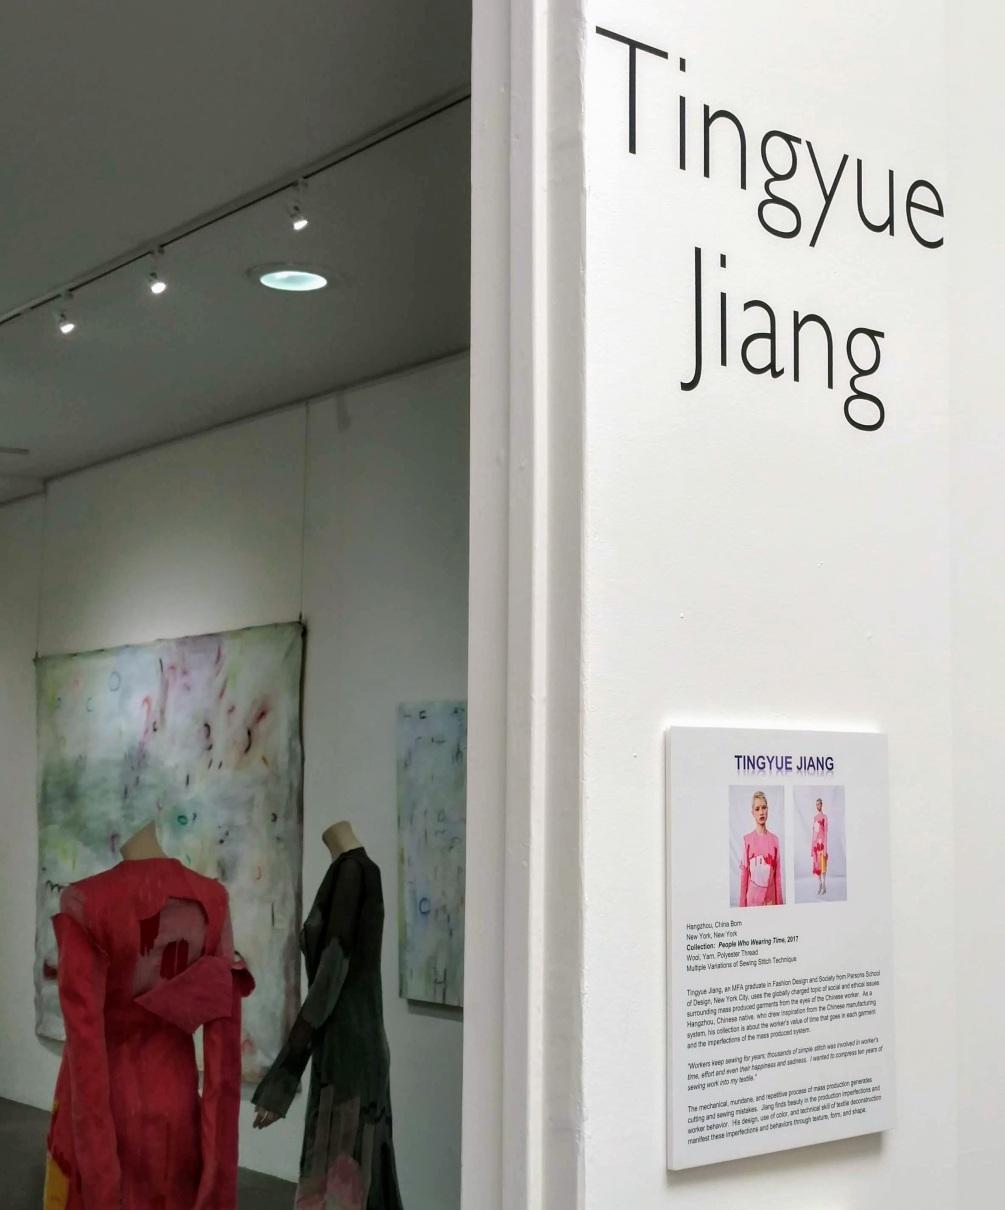 Blurred Boundaries Fashion as an Art, Tingyue Jiang, designer, ©EDGExpo.com